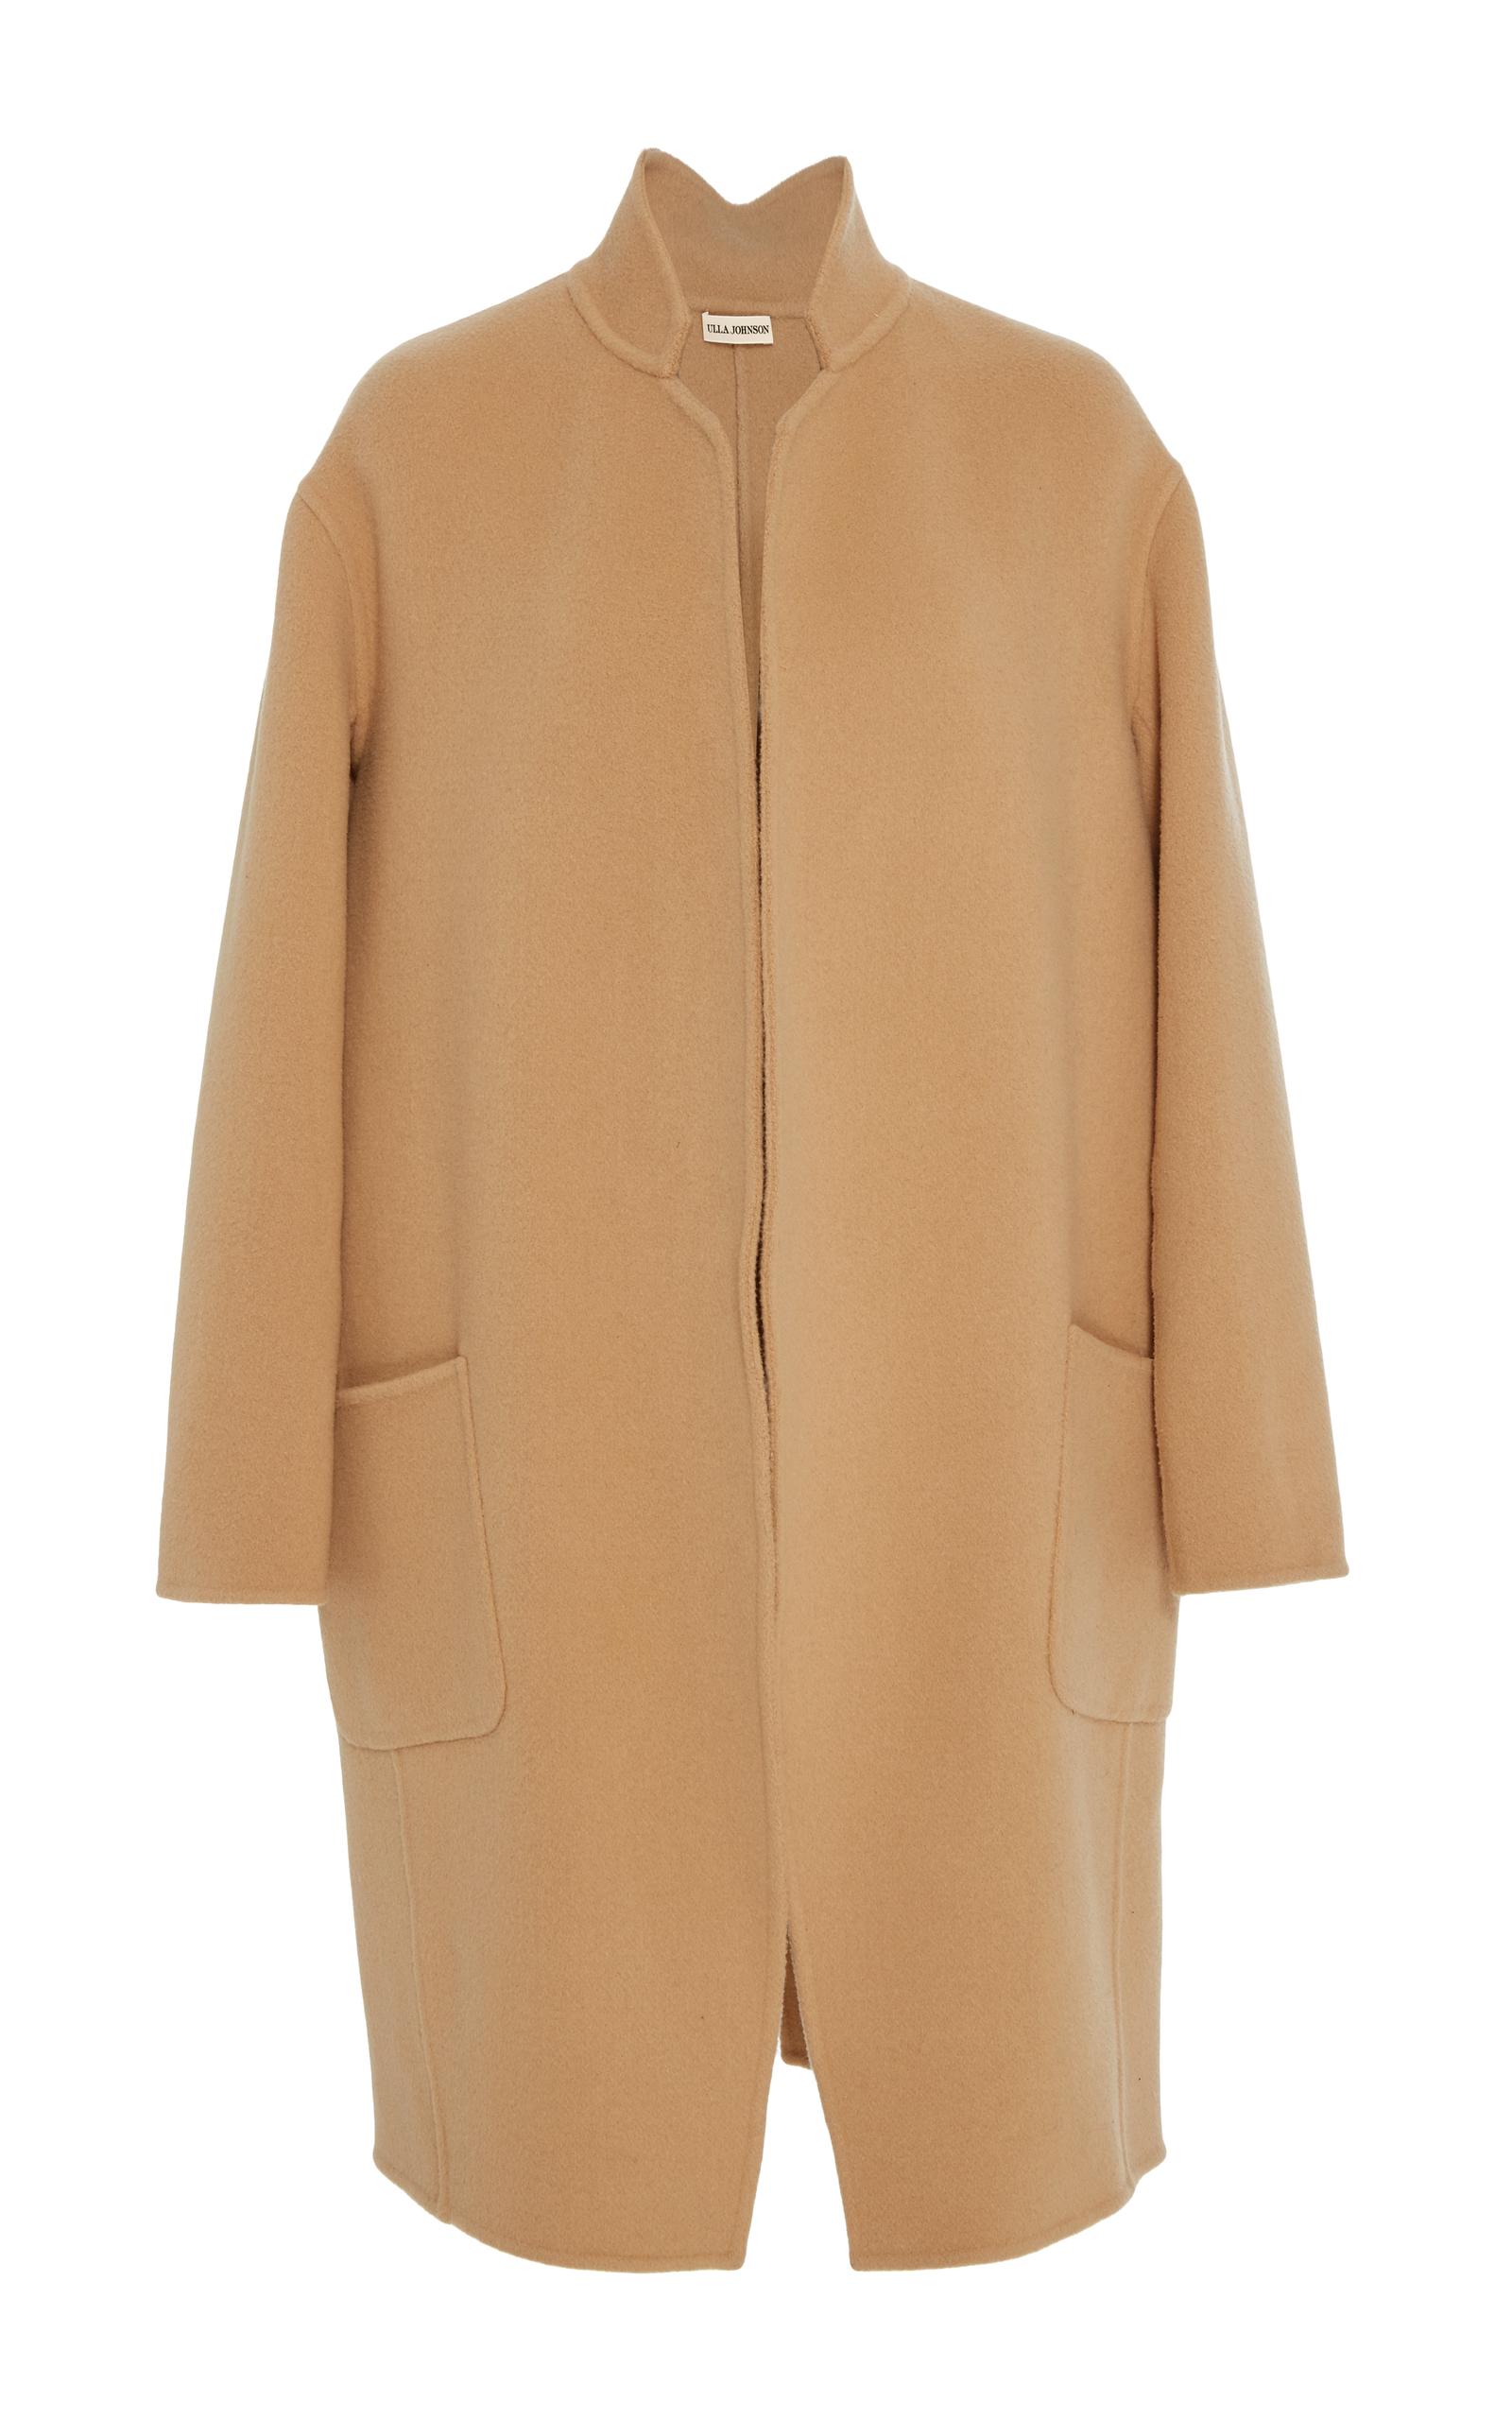 Buy Cheap Choice Ulla Johnson Eleanor coat Buy Cheap Finishline Free Shipping Low Price Fee Shipping iXOw08U